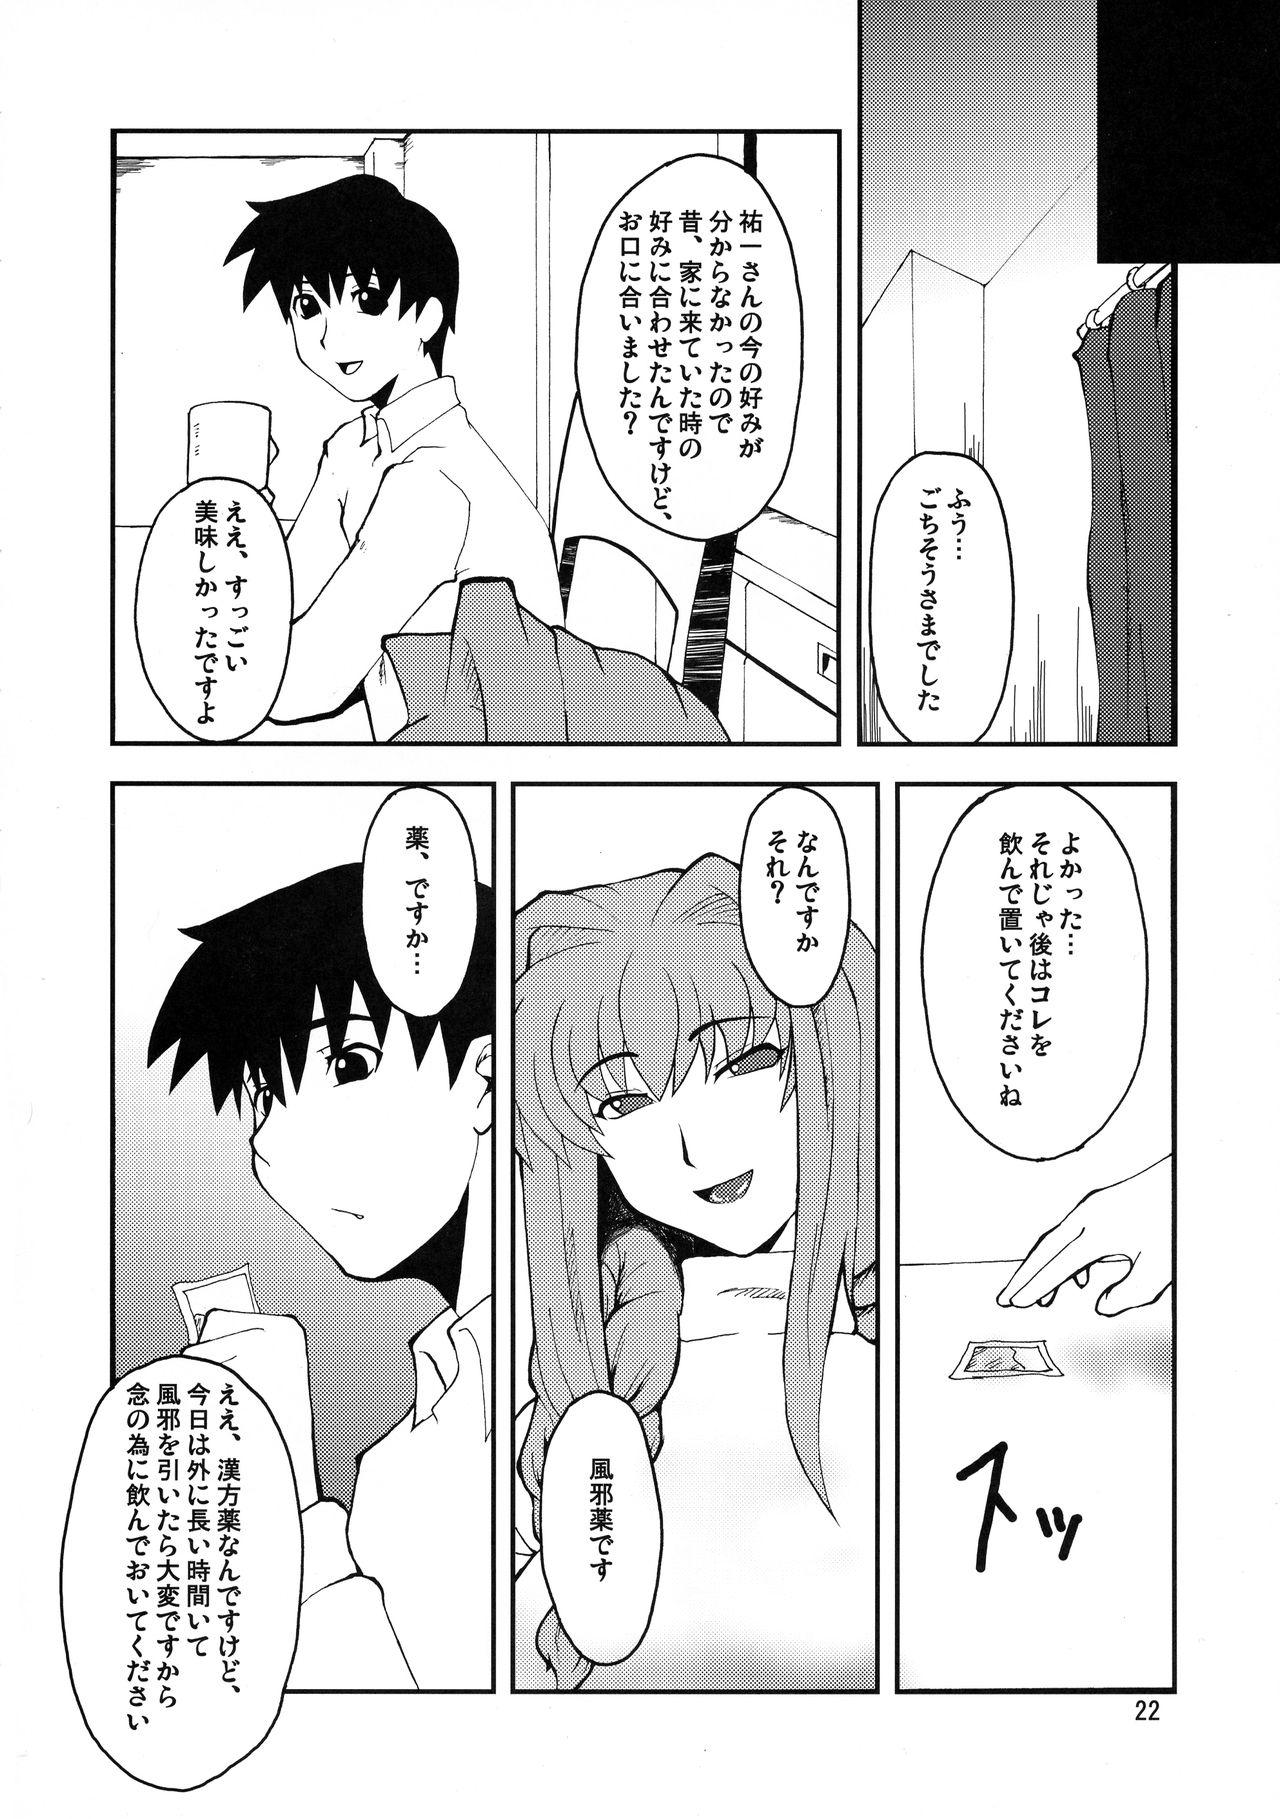 Kyouki Vol. 3~5 Remake Ver. 21